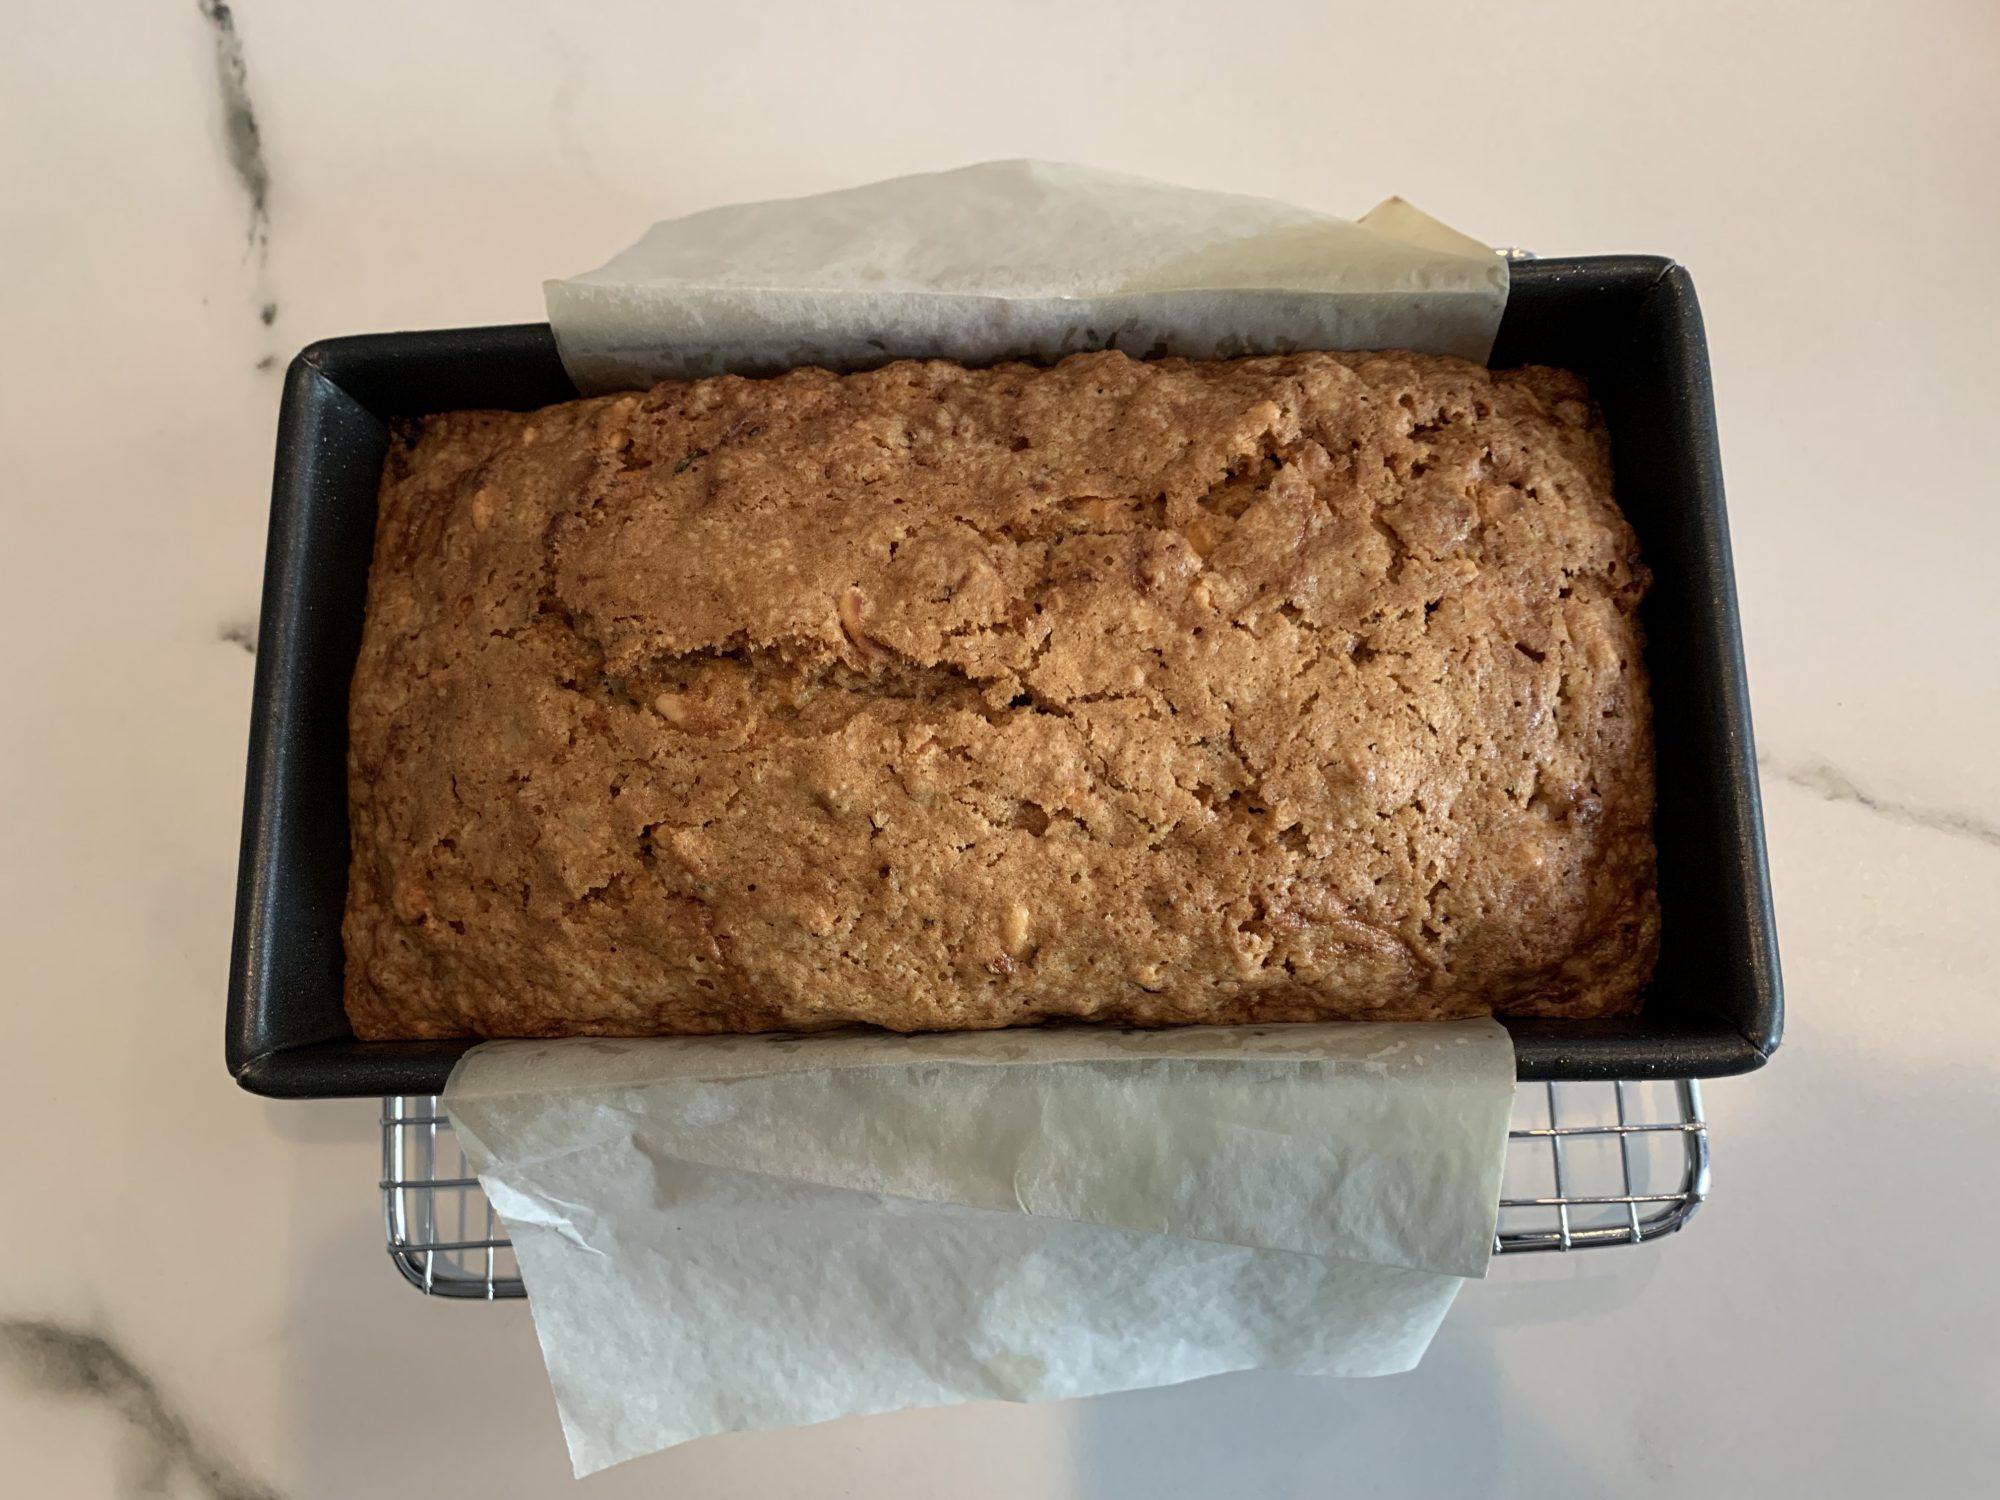 zucchini-bread-baked